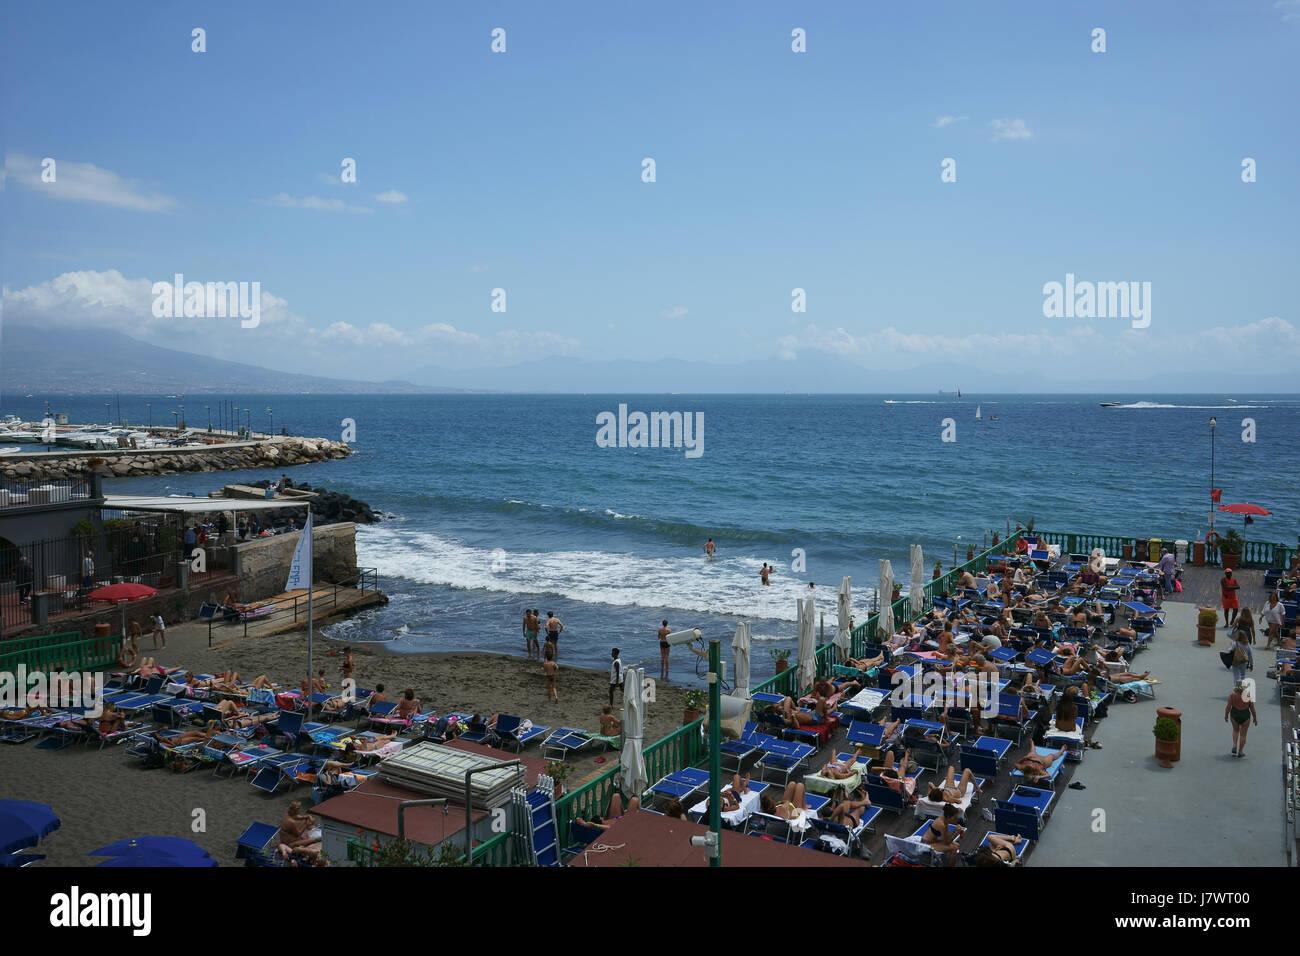 Bagno sirena stock photos bagno sirena stock images alamy